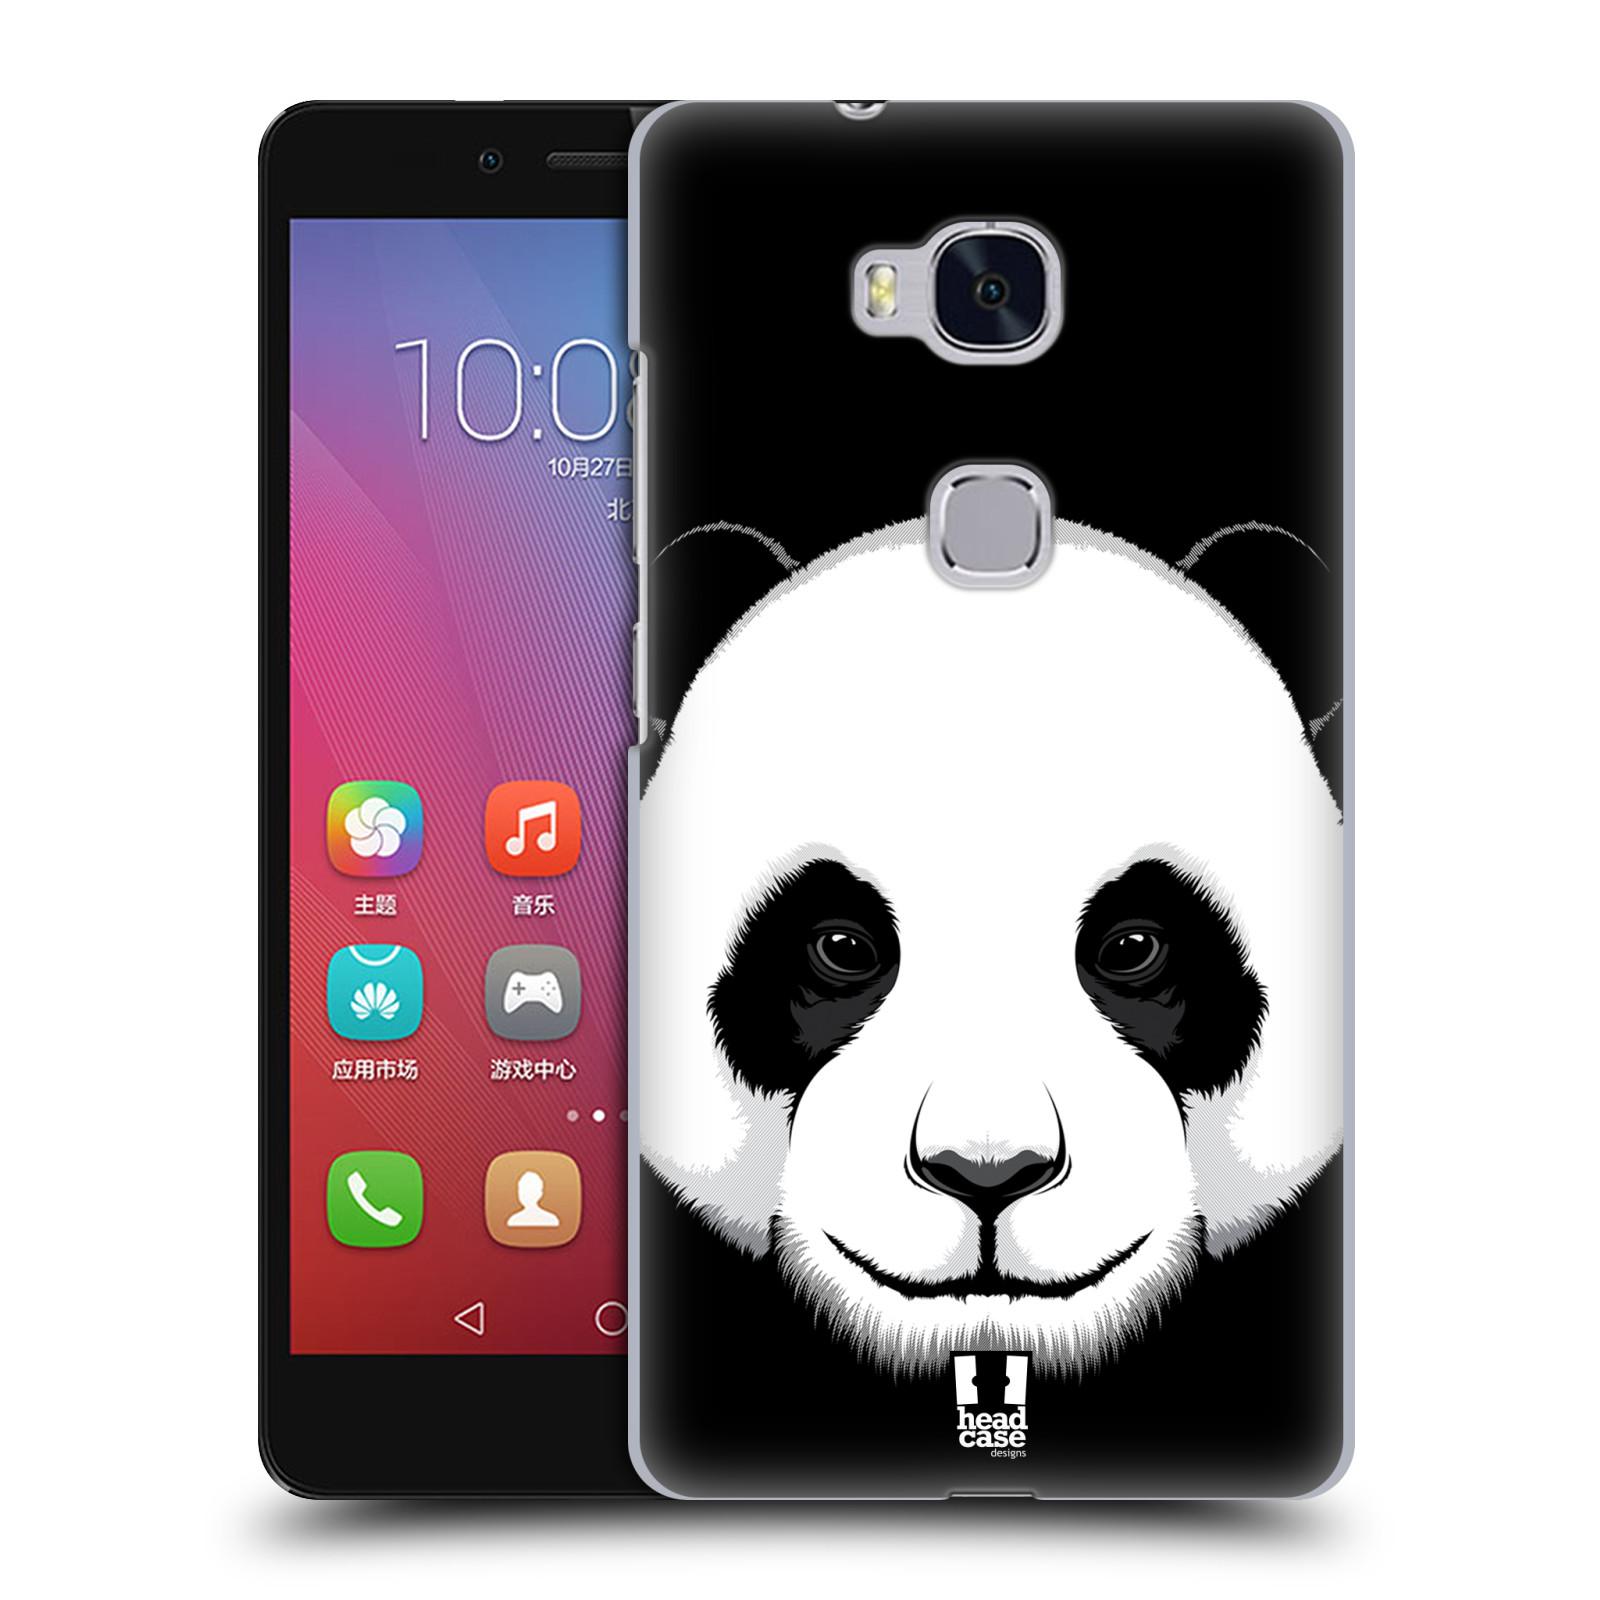 HEAD CASE pevný plastový obal na mobil HUAWEI HONOR 5X vzor Zvíře kreslená tvář panda